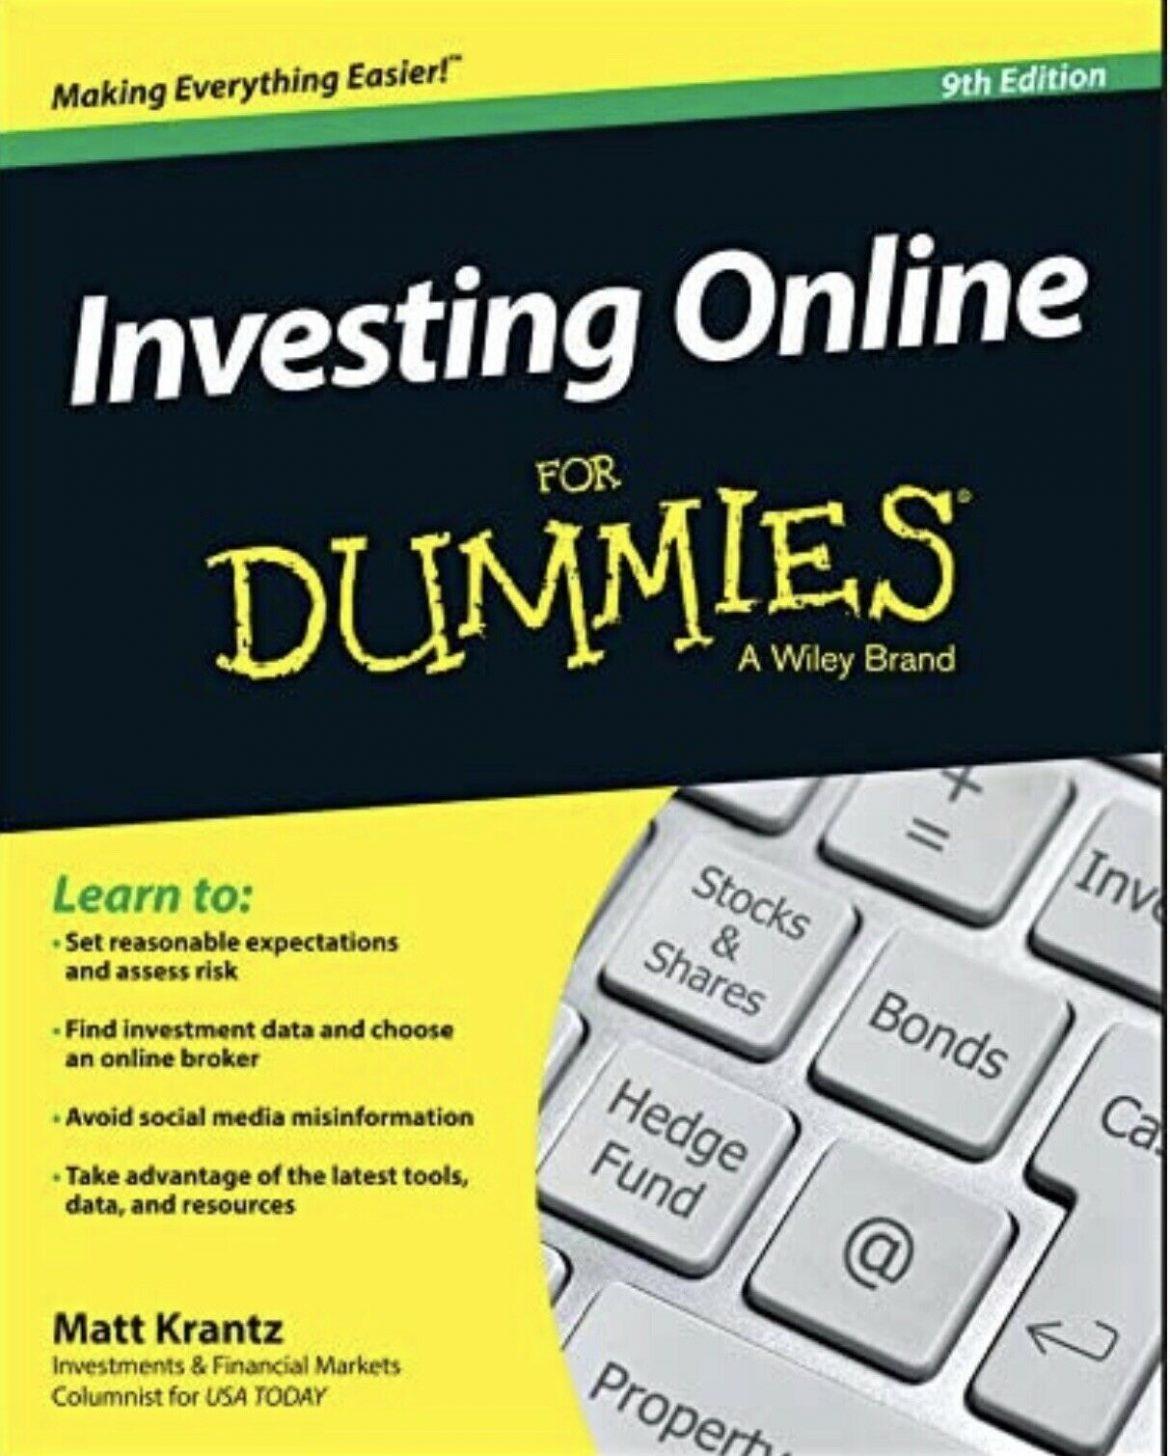 NEW Investing Online for Dummies by: Matthew Krantz (Trade Paperback)